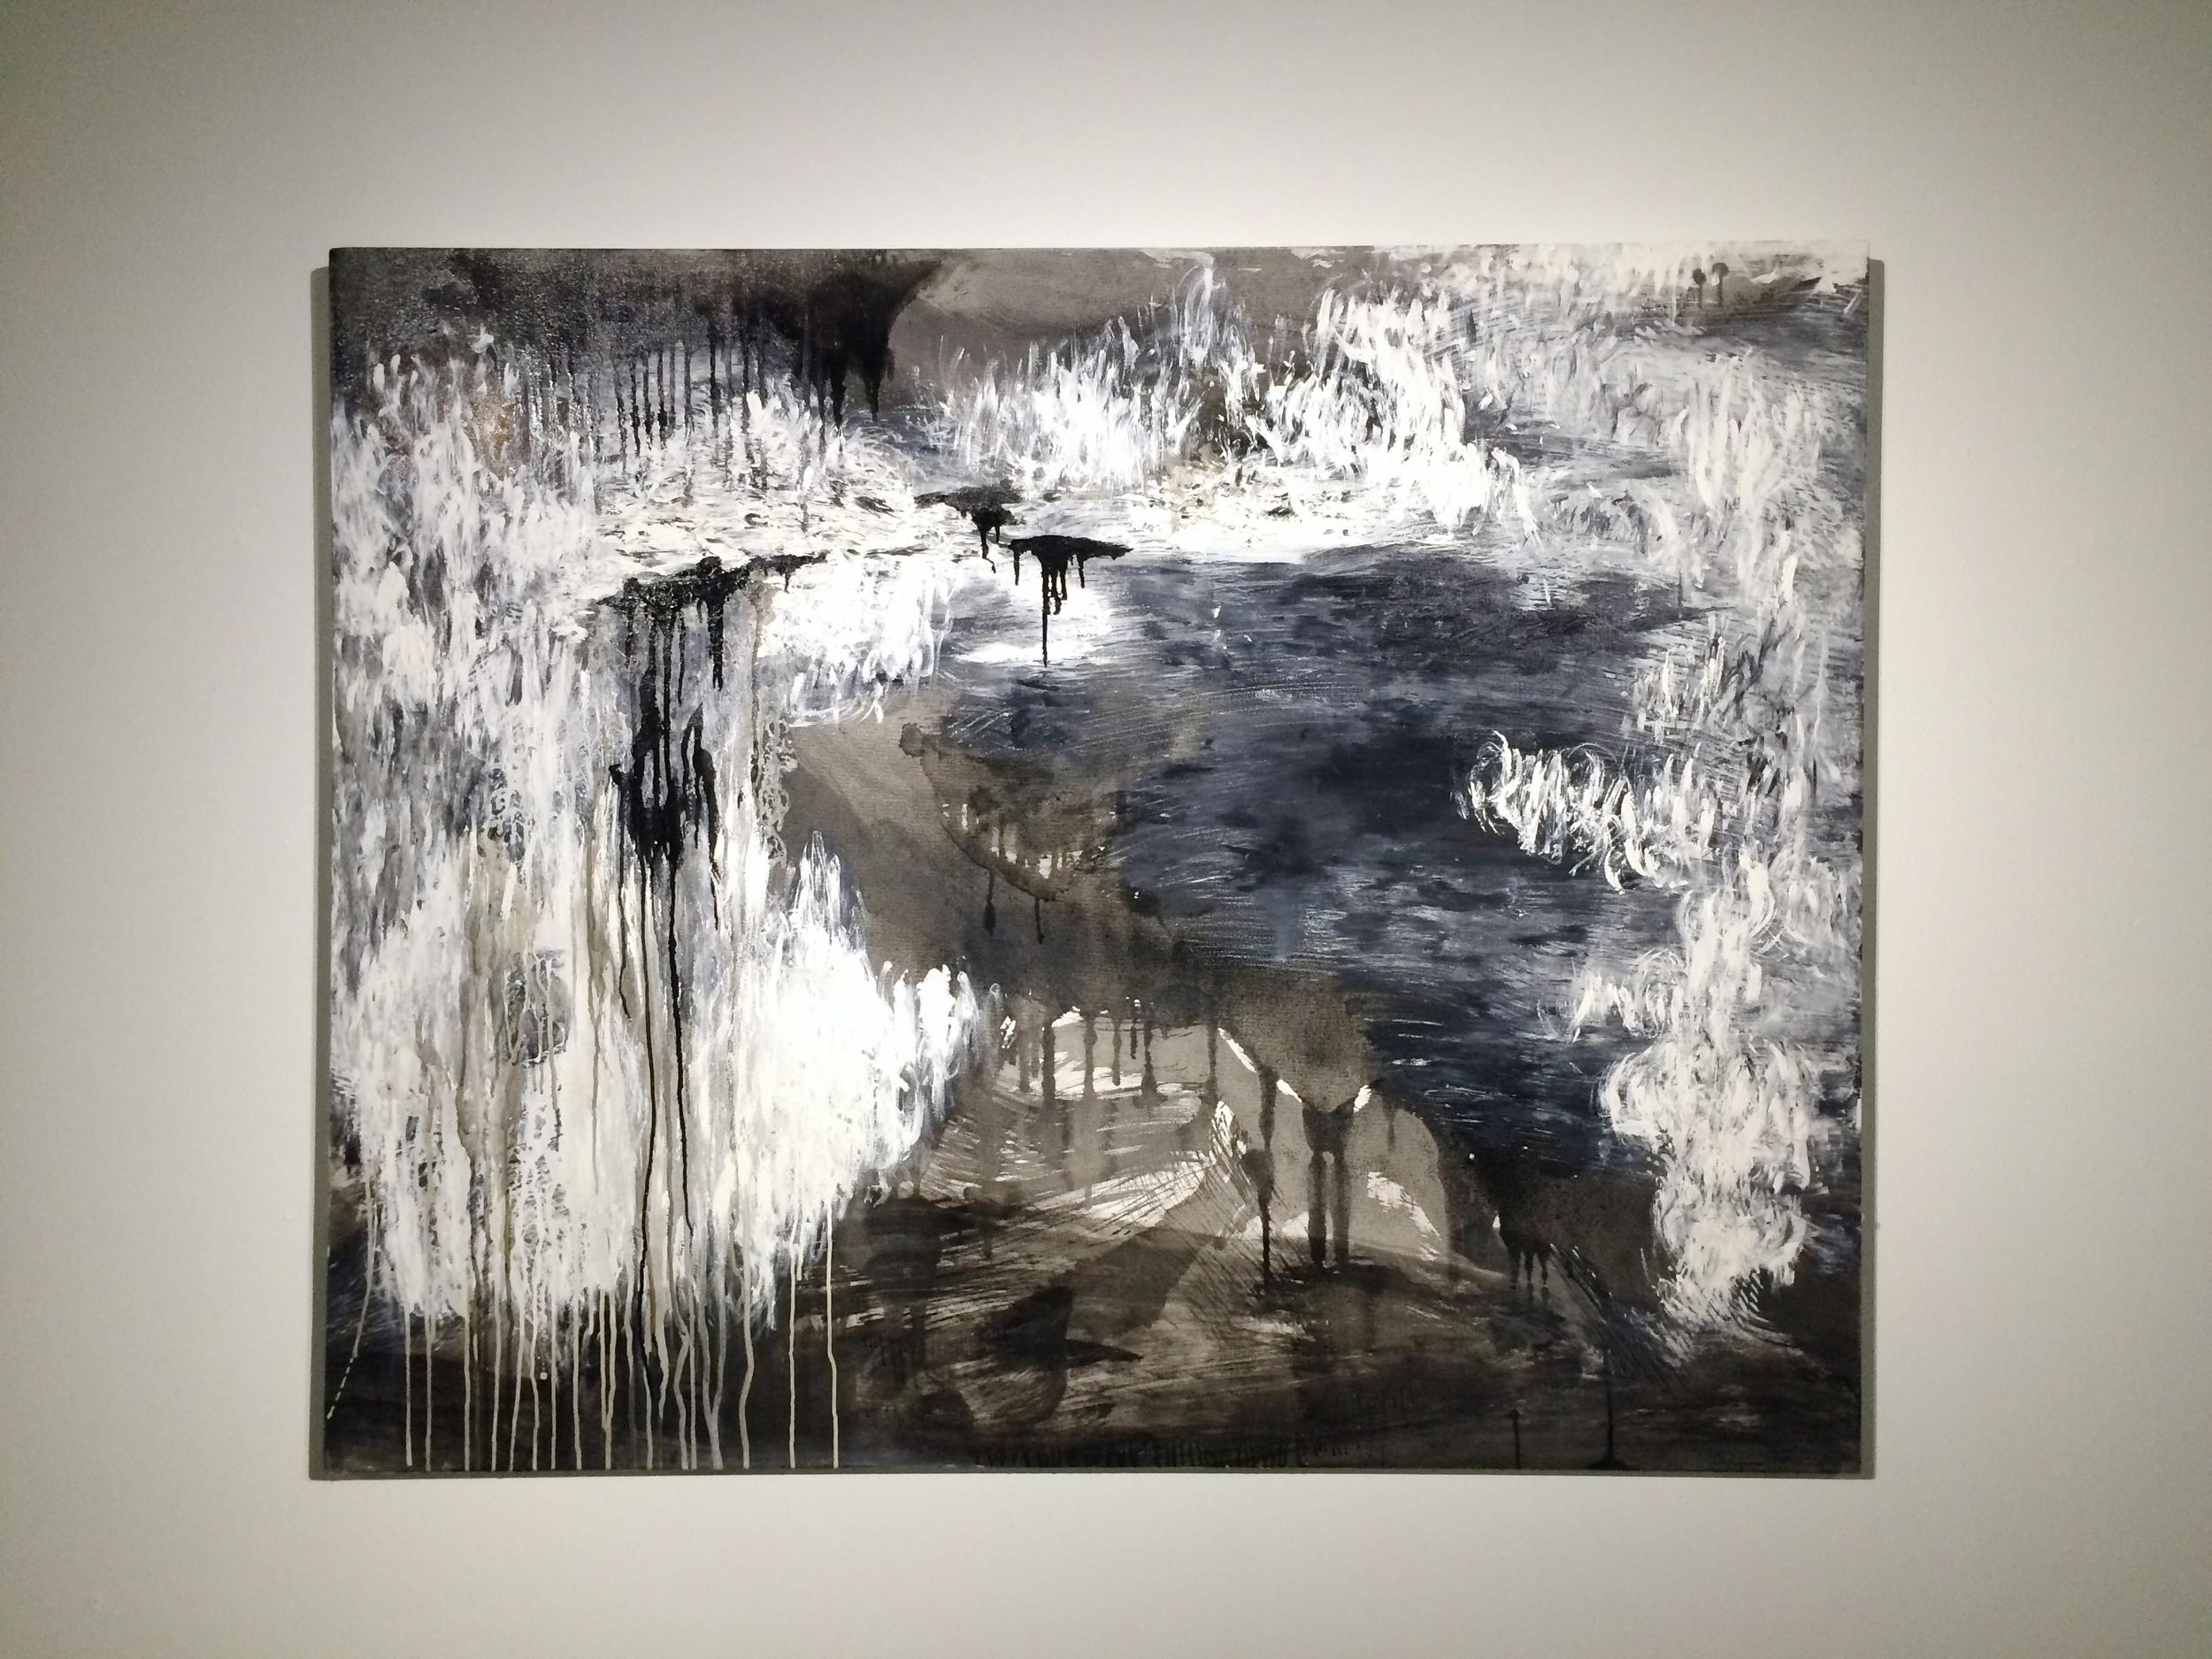 Untitled No. 10—(2/6)